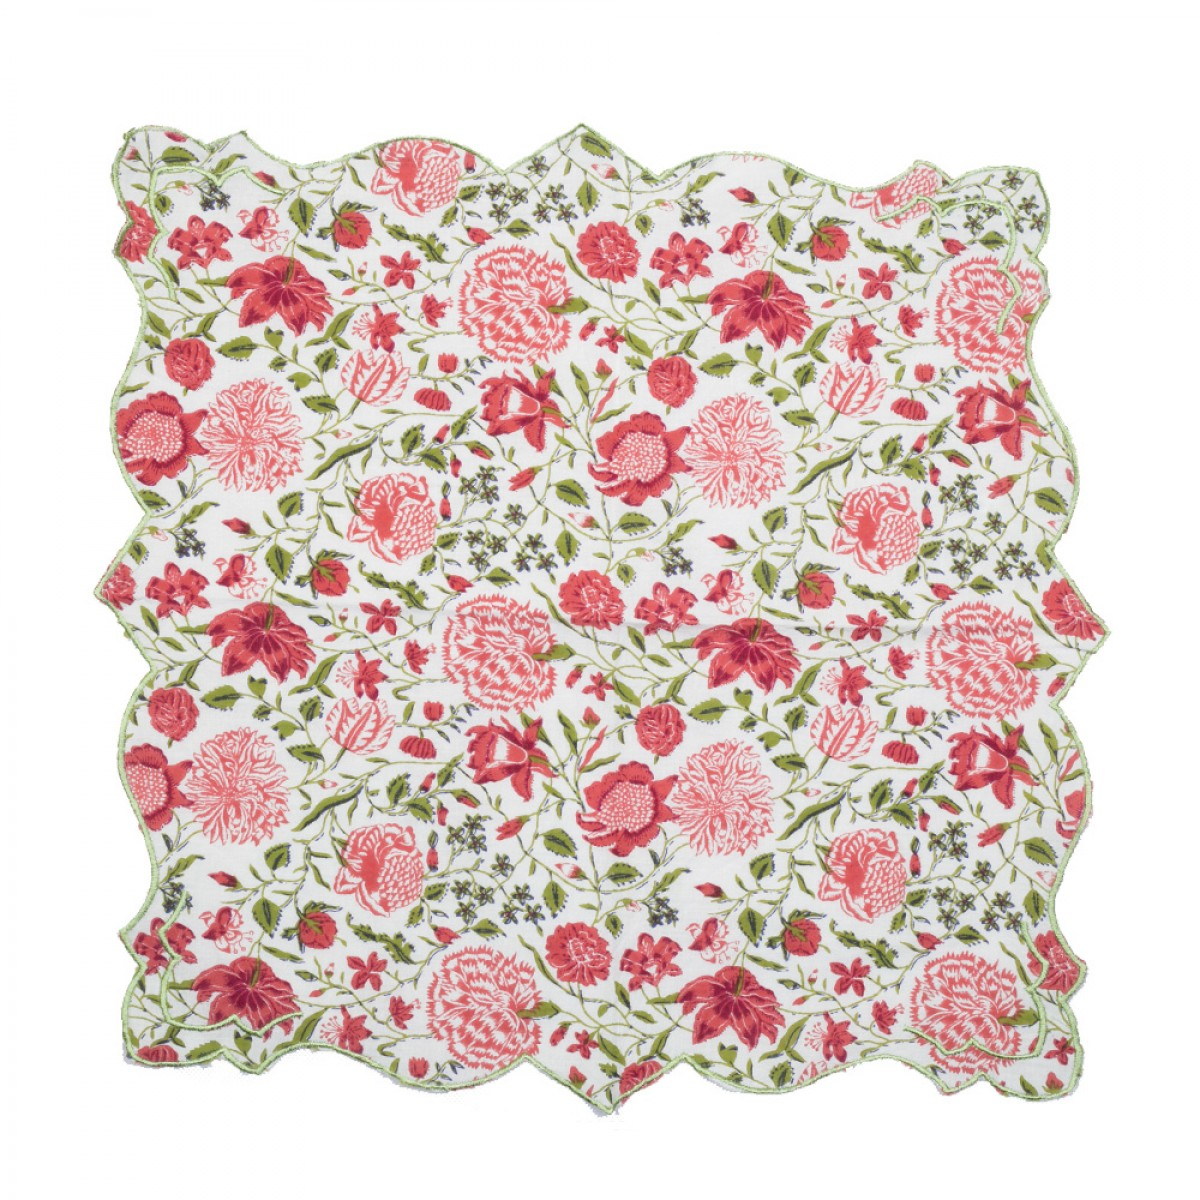 Cotton Scallop Embroidered Printed Napkin - Spring Garden (Set of 6)